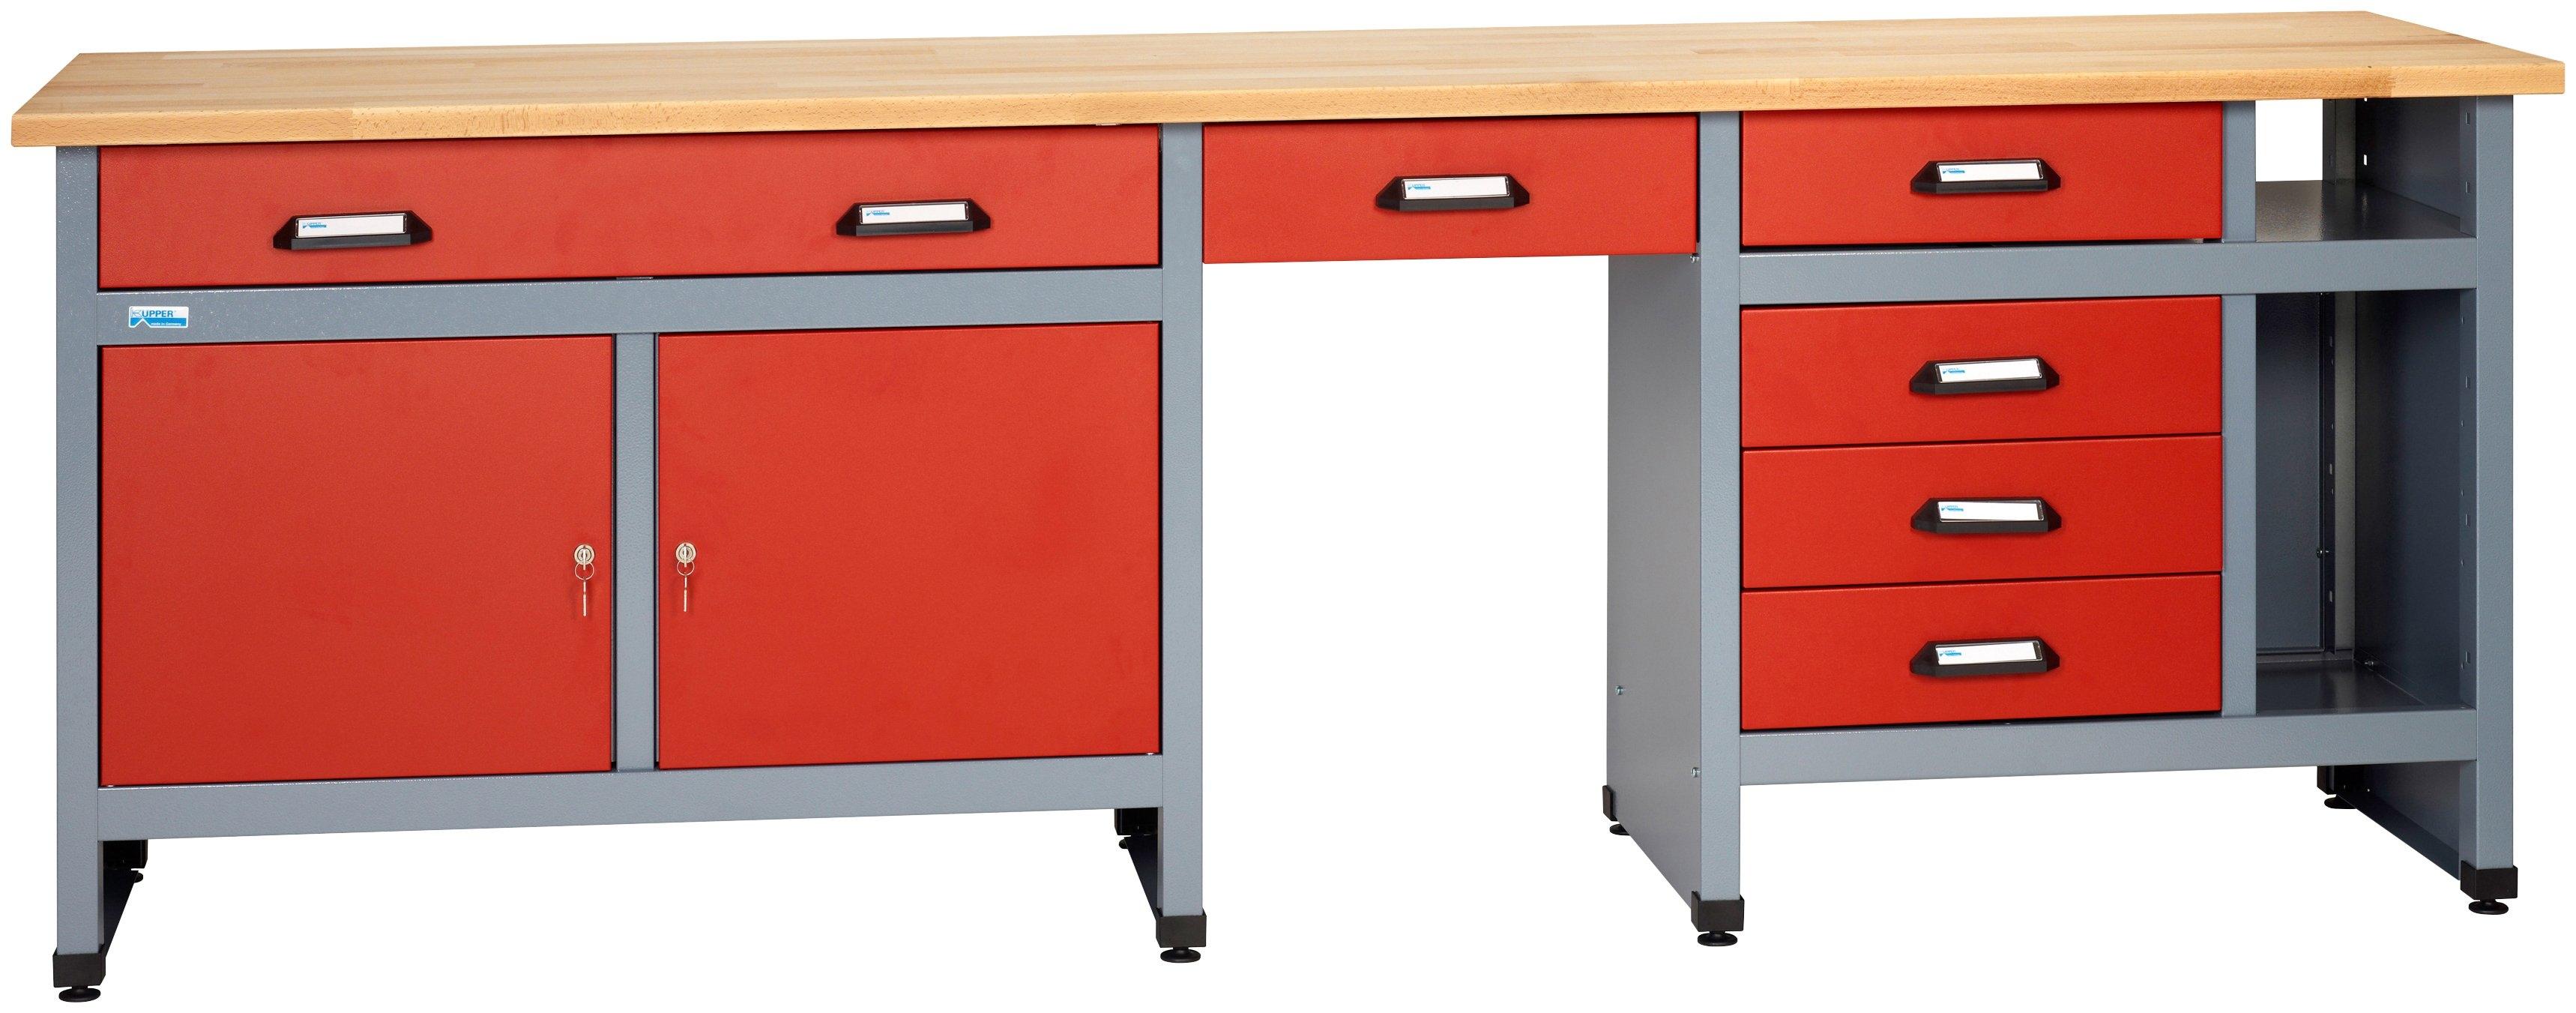 k pper werkbank 6 laden 2 deuren in rood speciale. Black Bedroom Furniture Sets. Home Design Ideas